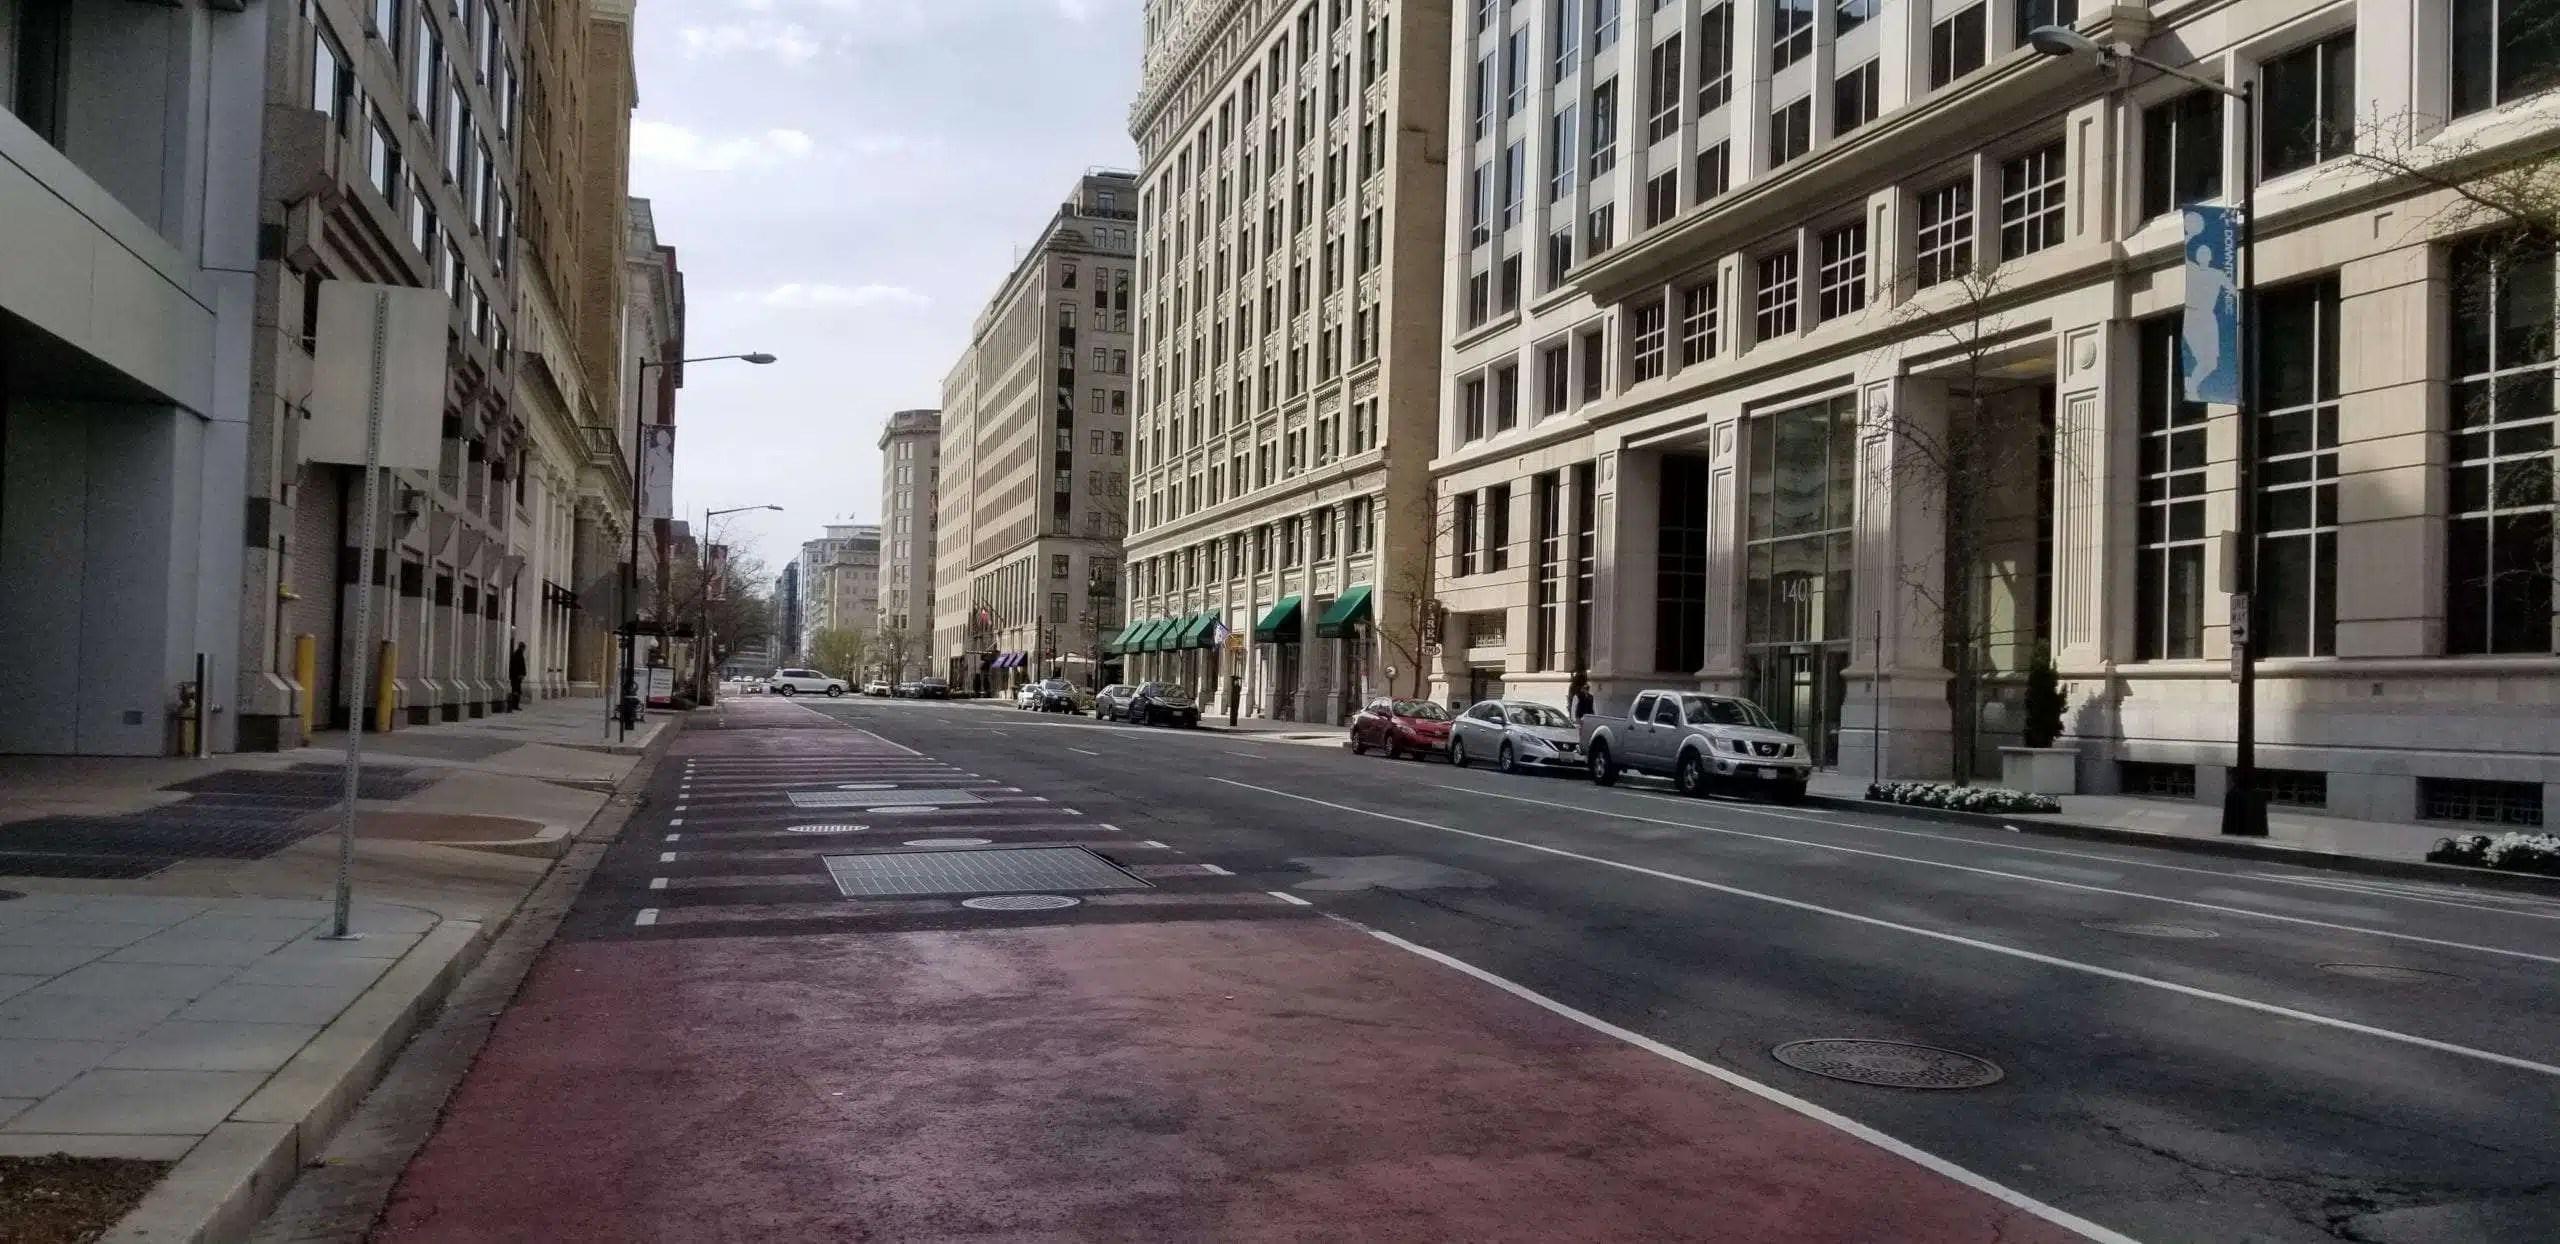 Washington DC during coronavirus quarantine March 22